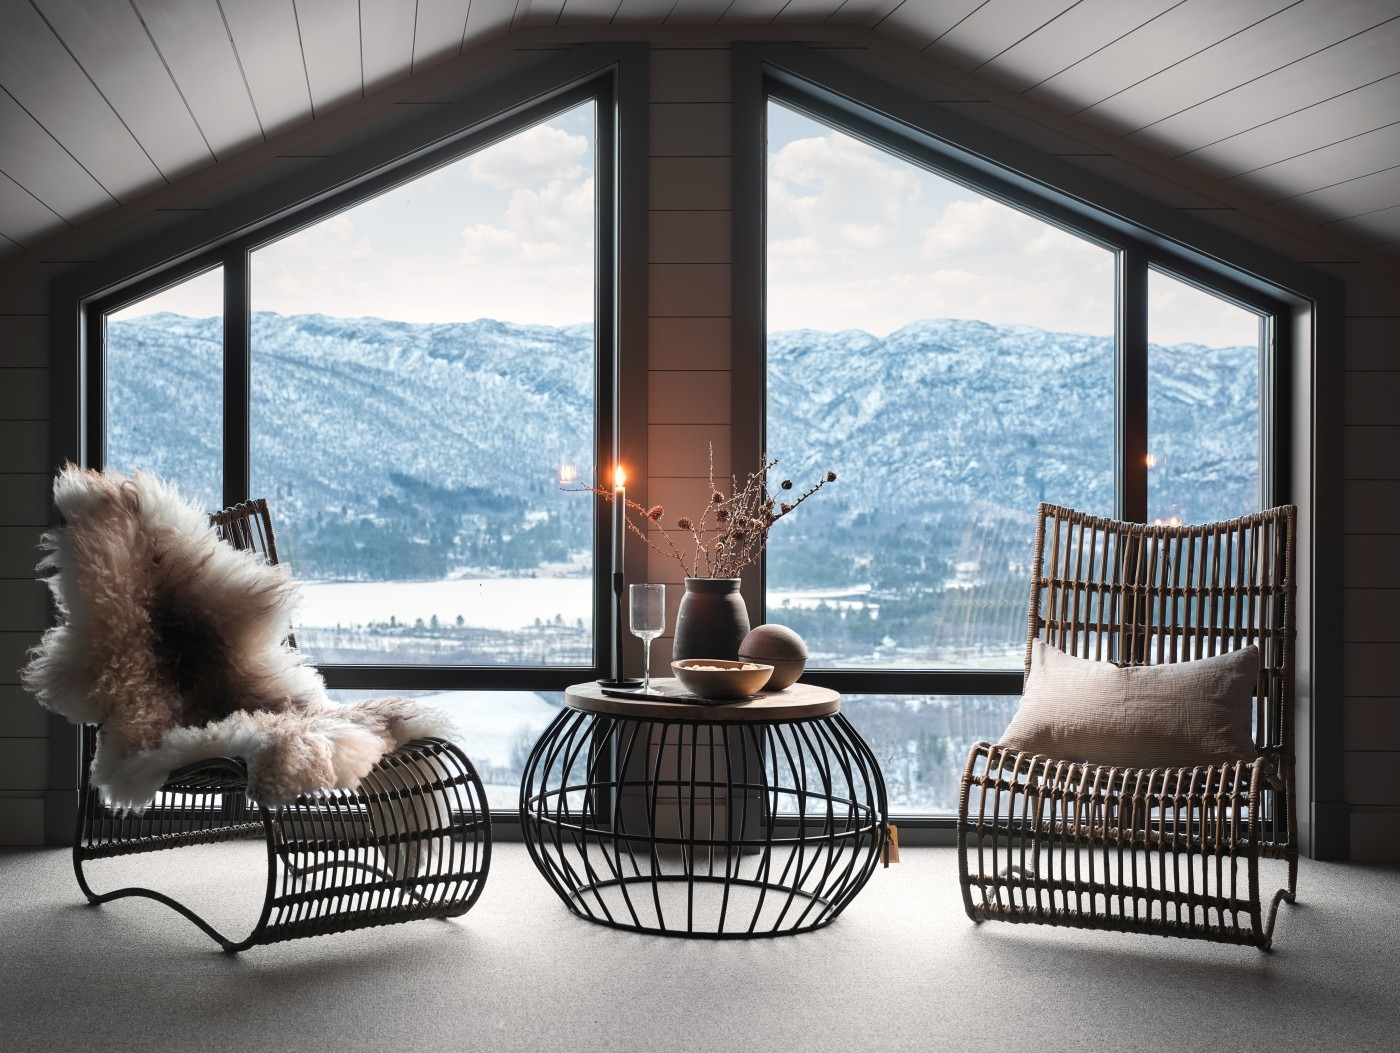 PRINT_2020-11-19 Geilobygg hytte Gullsteinvegen-7525